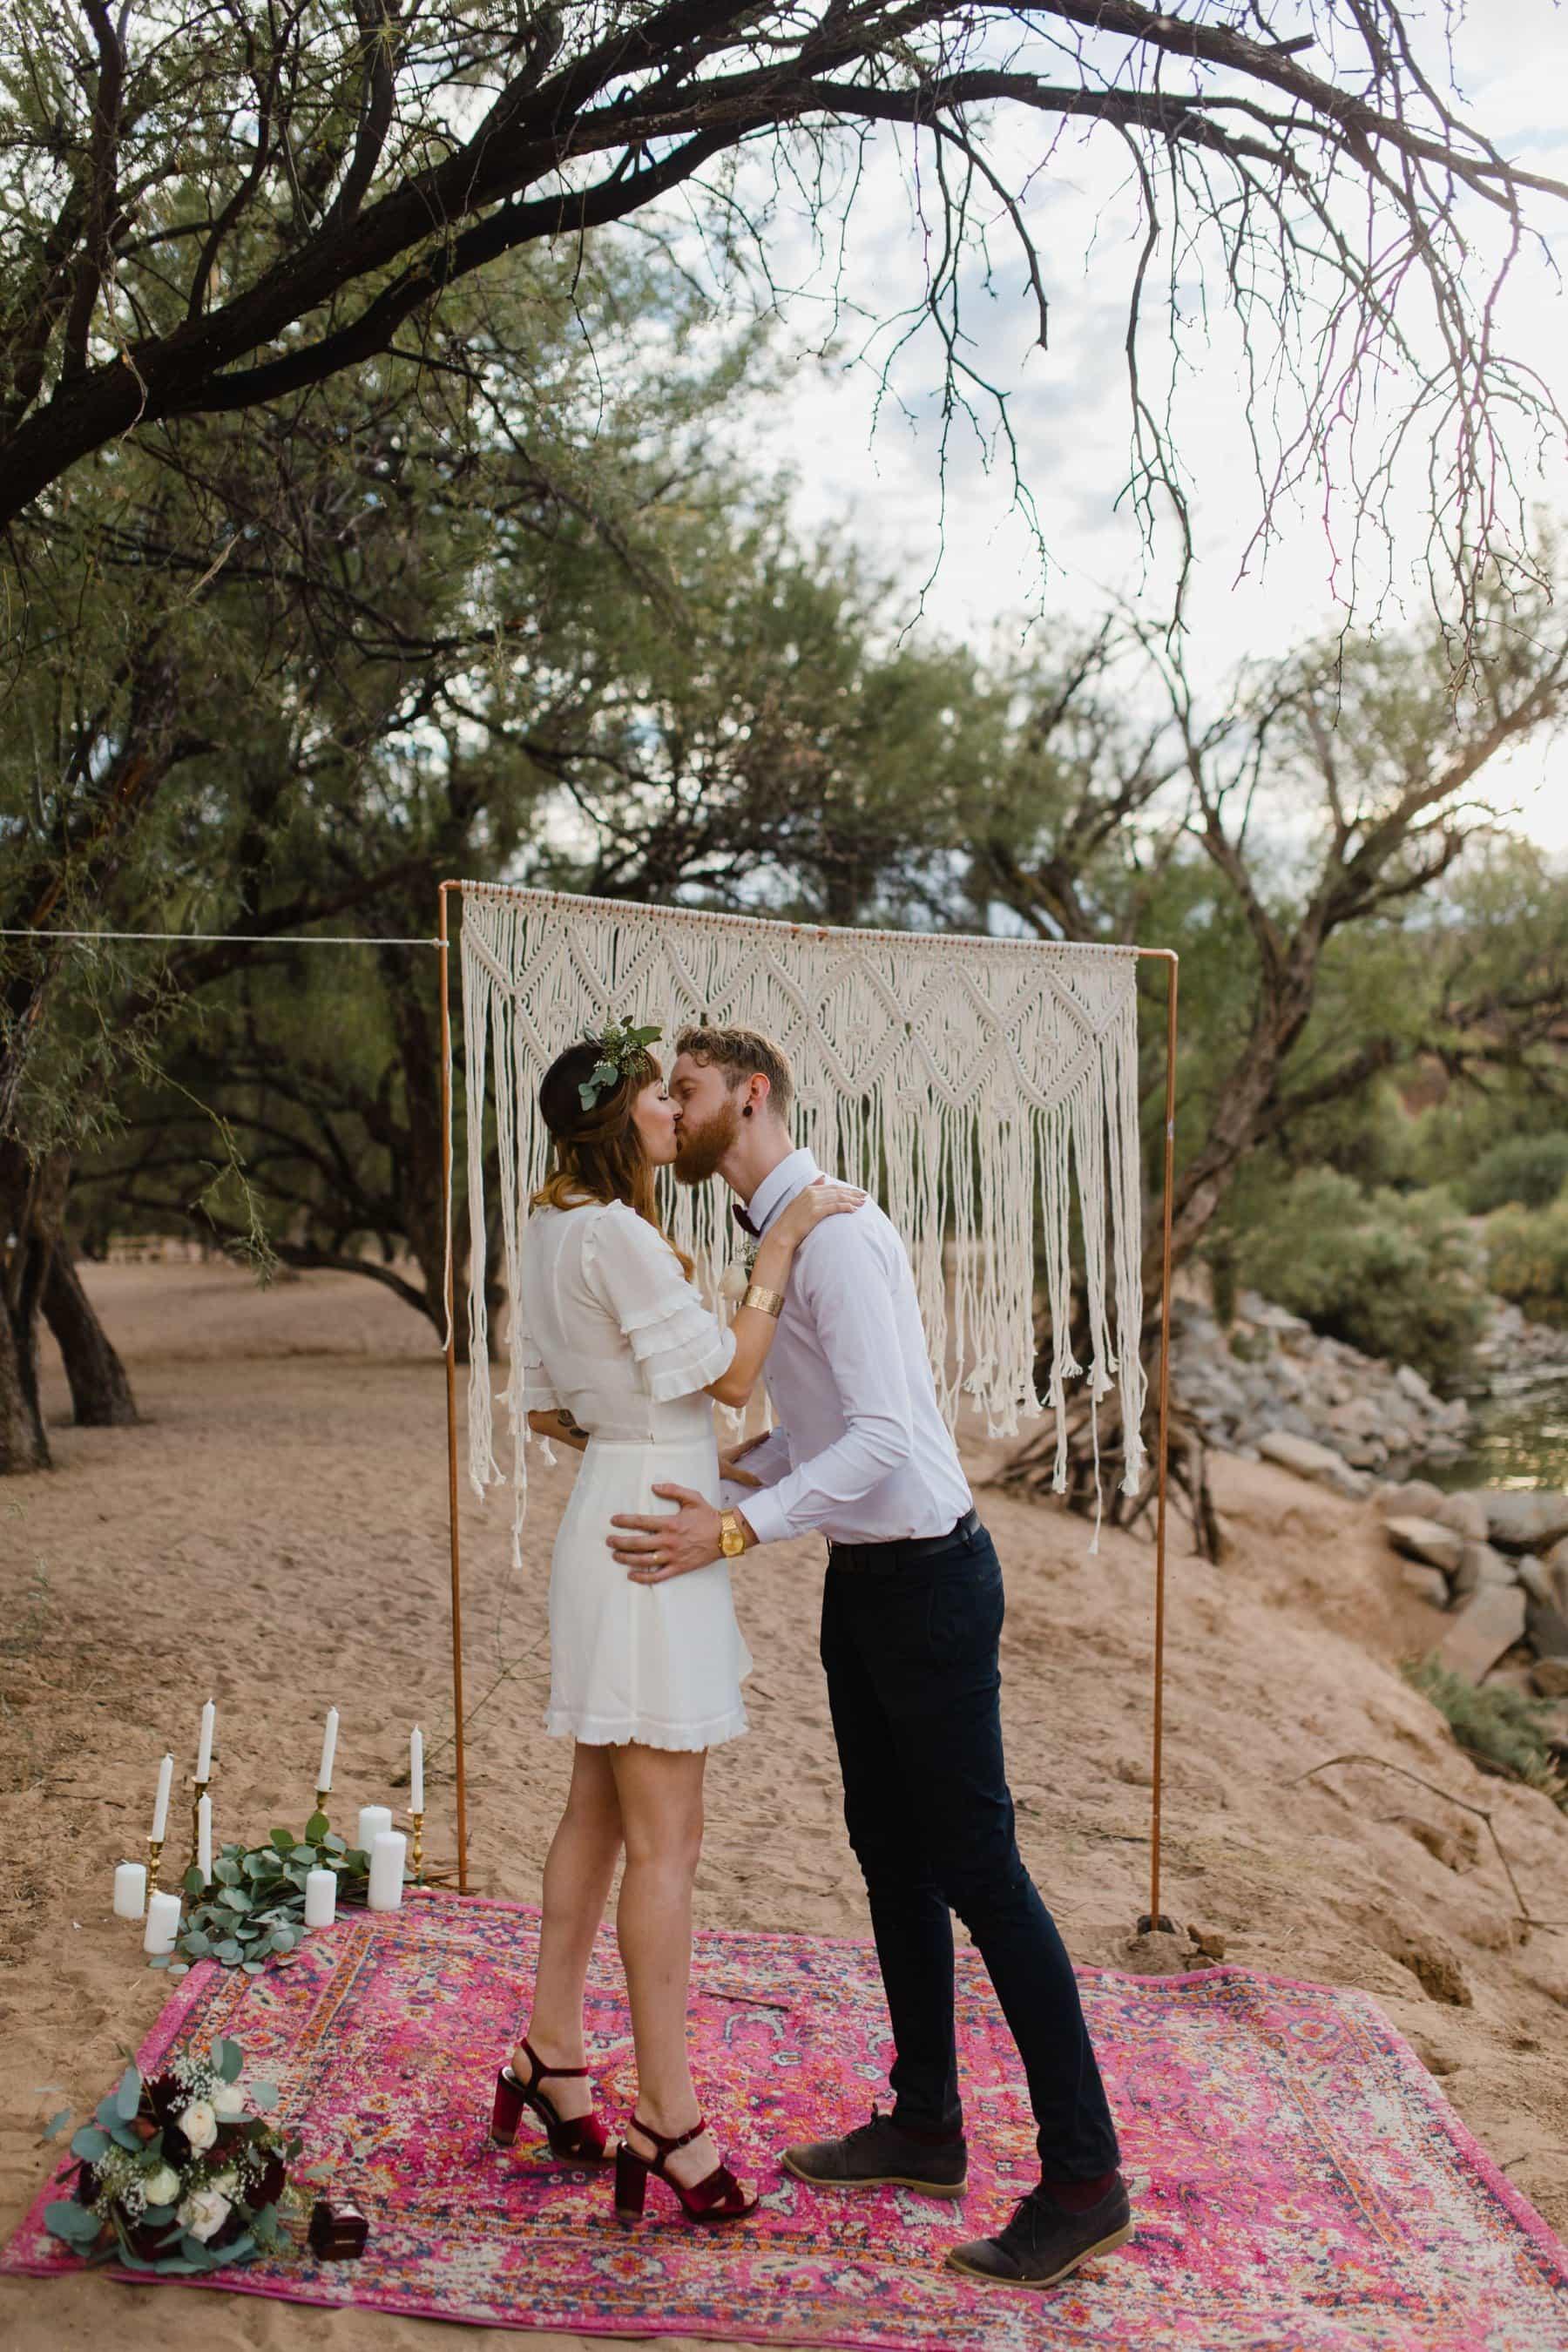 Salt River elopement photos with macrame and rug